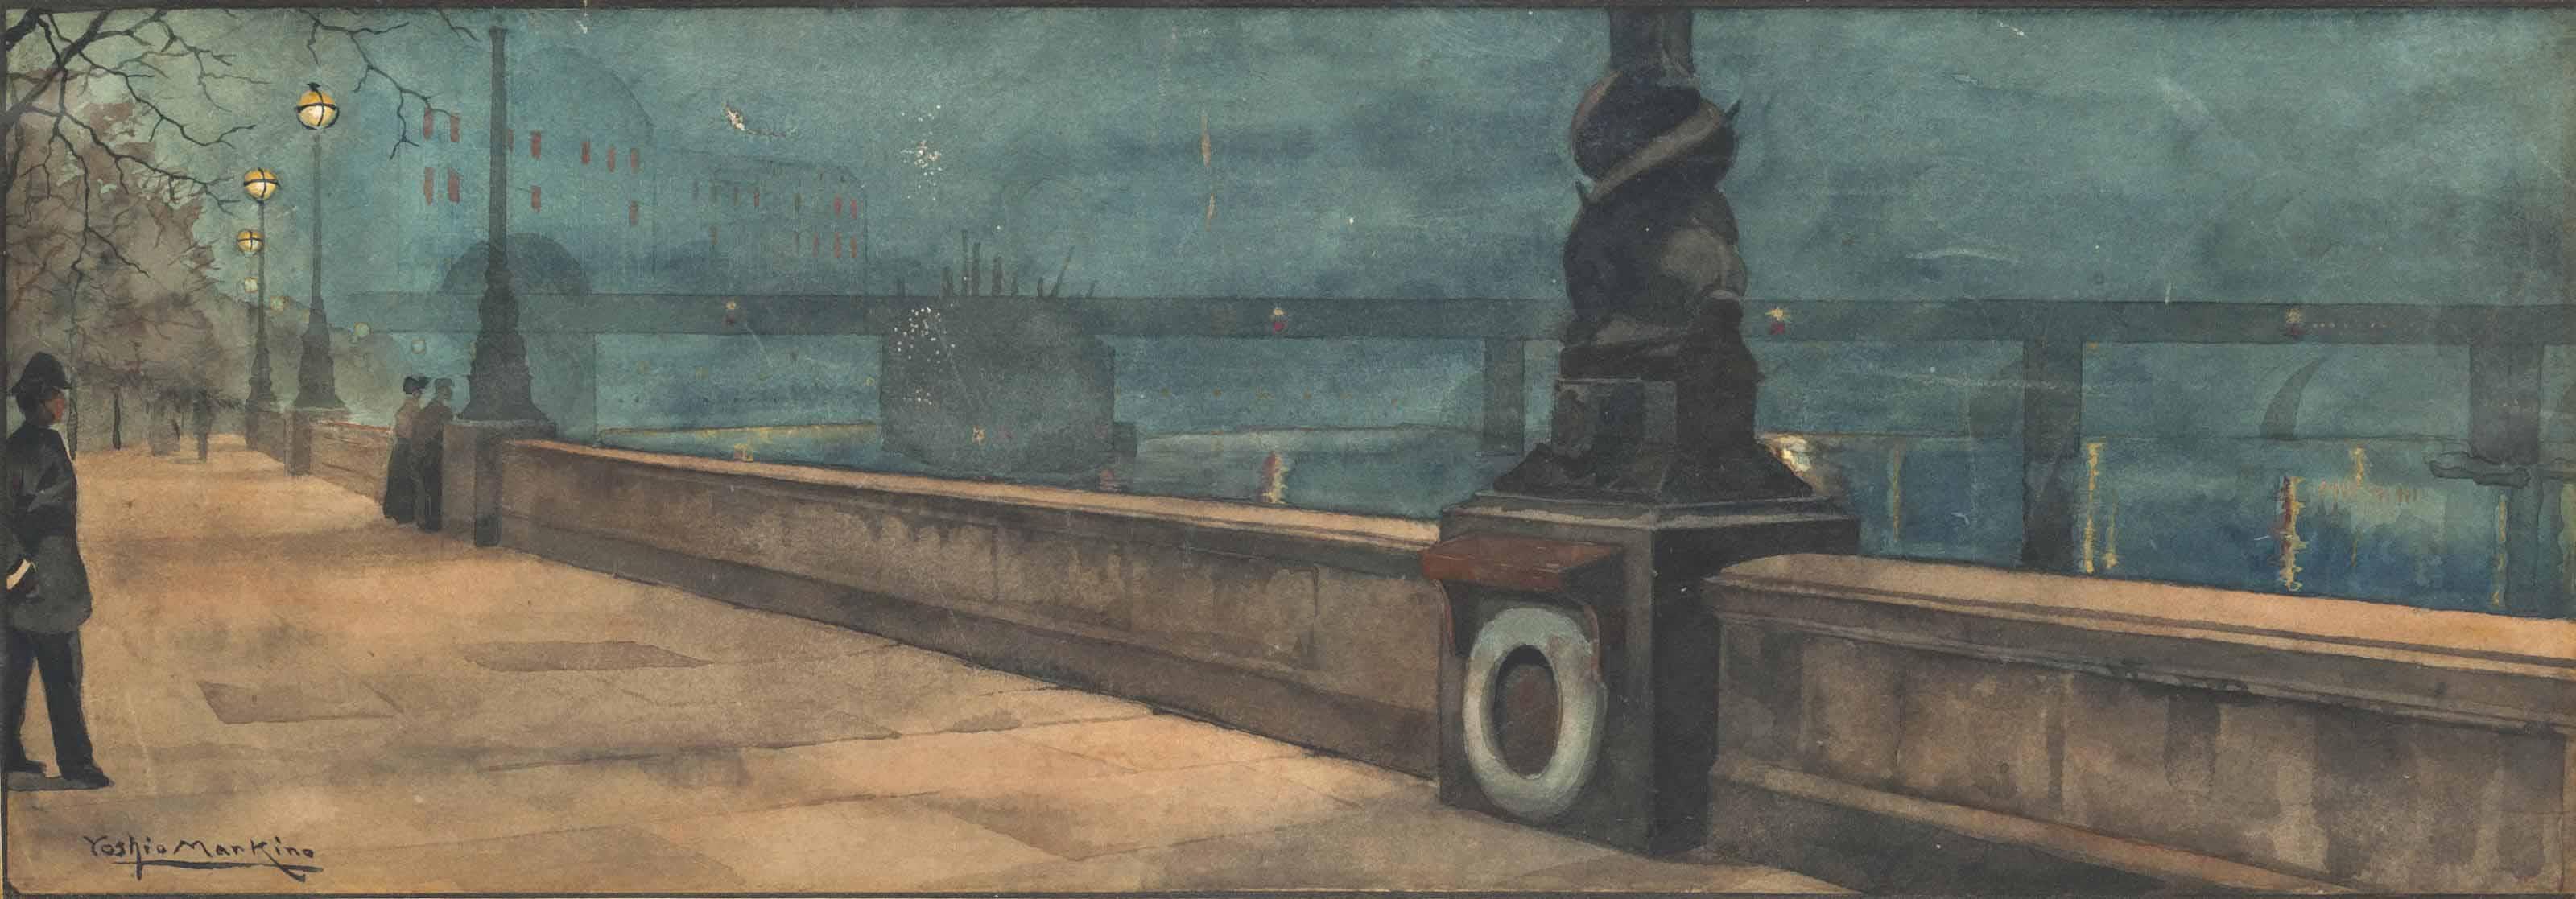 Evening on the Embankment